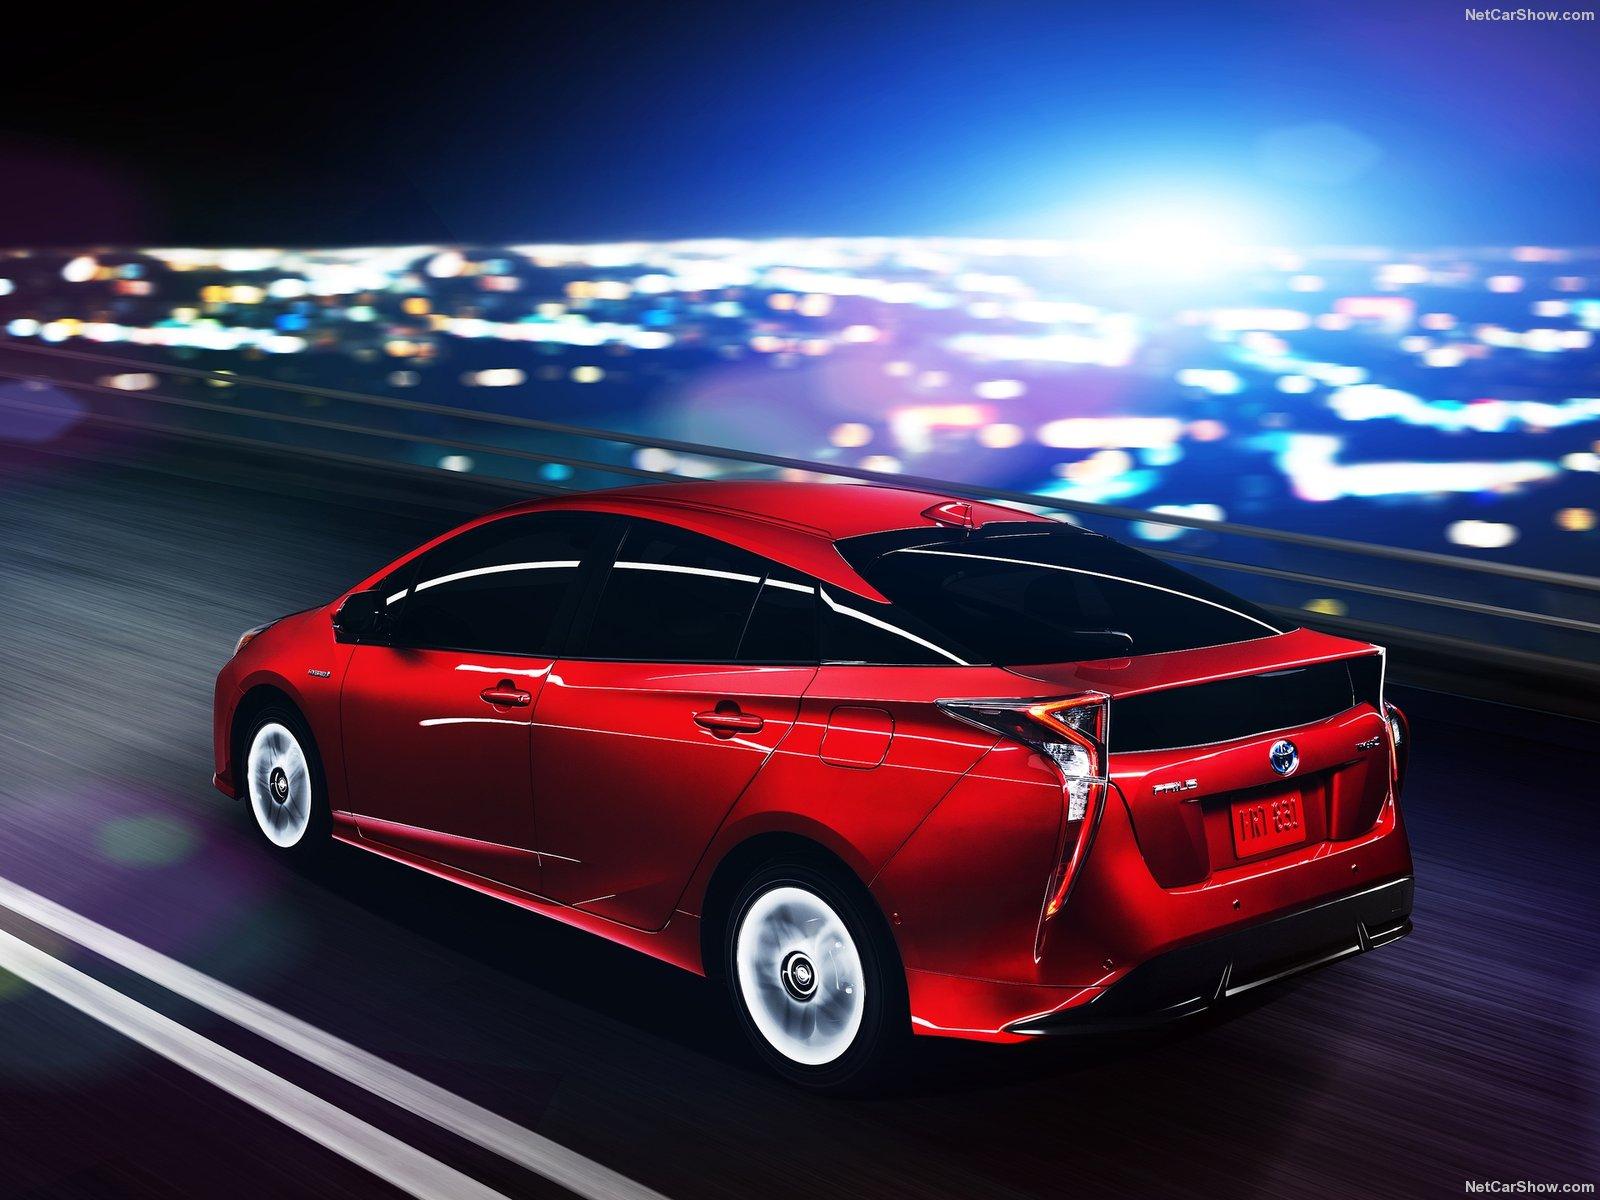 Toyota-Prius_2016_1600x1200_wallpaper_3c.jpg